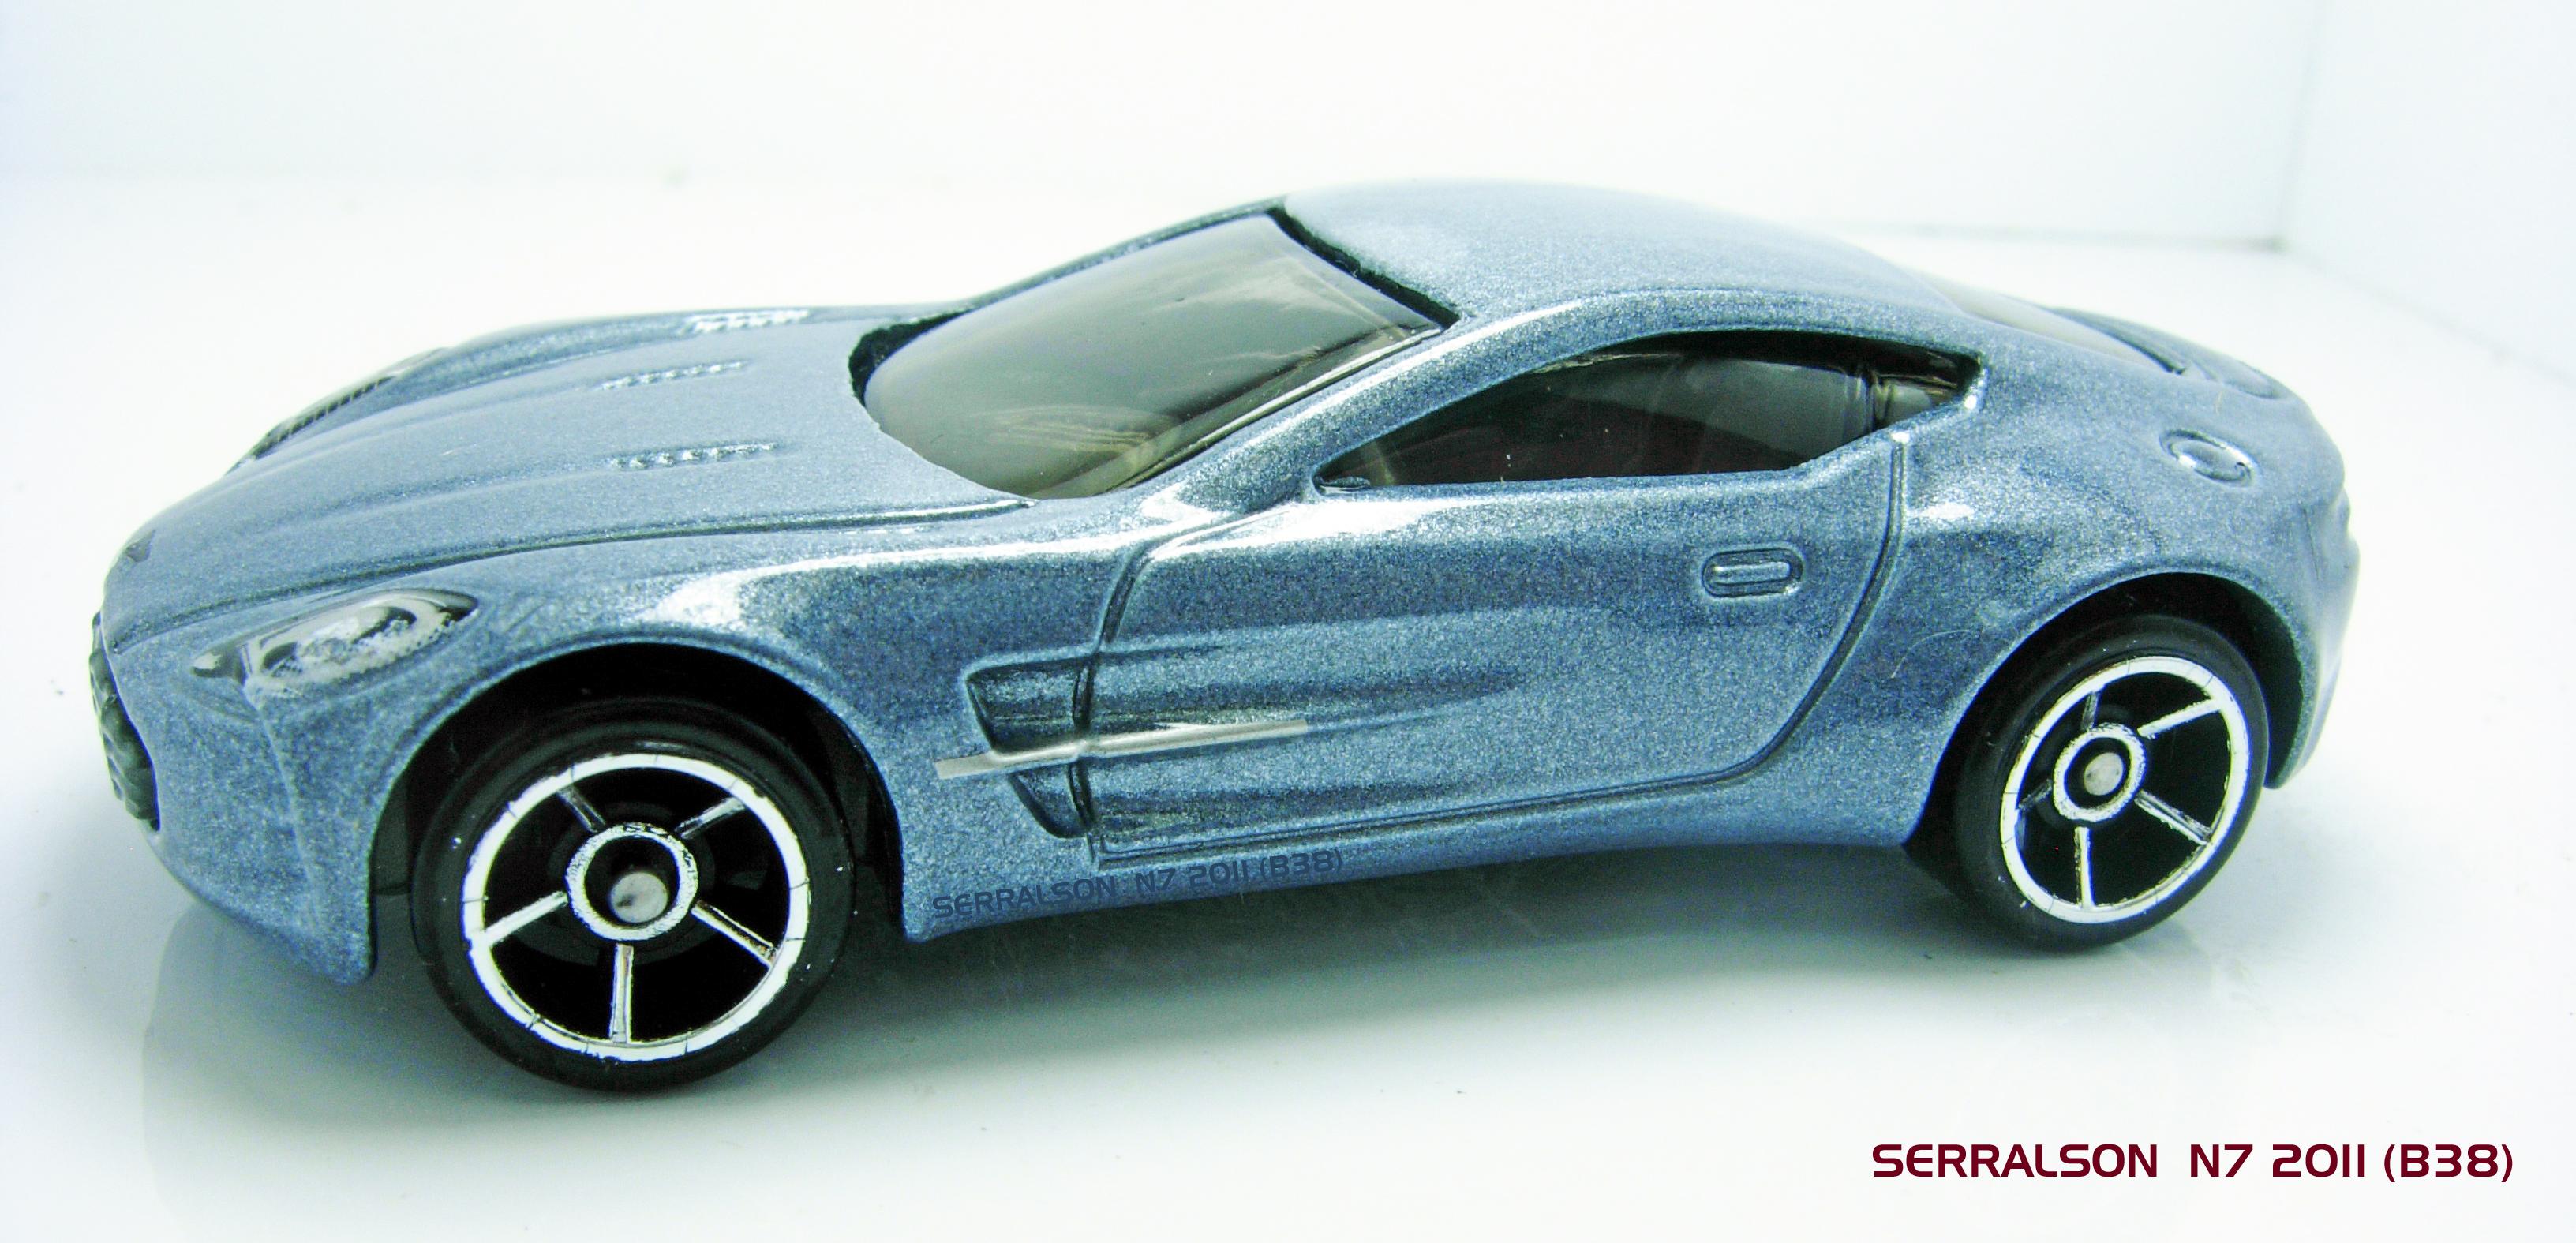 image - aston martin one 77 a | hot wheels wiki | fandom